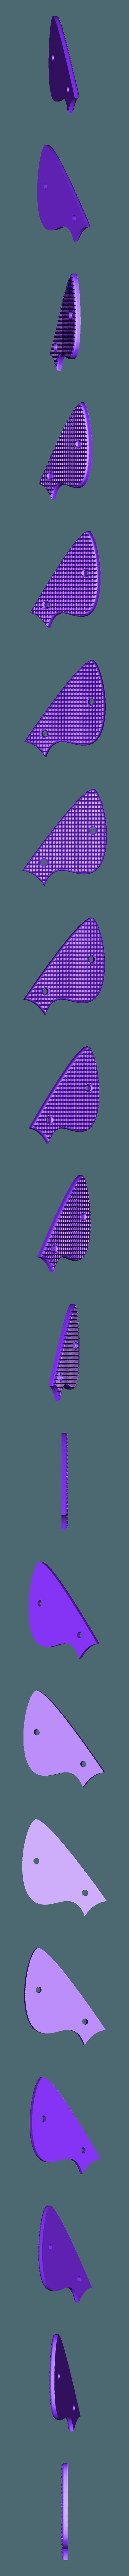 Grip_2.stl Download free STL file Raygun • 3D print template, cmoore1